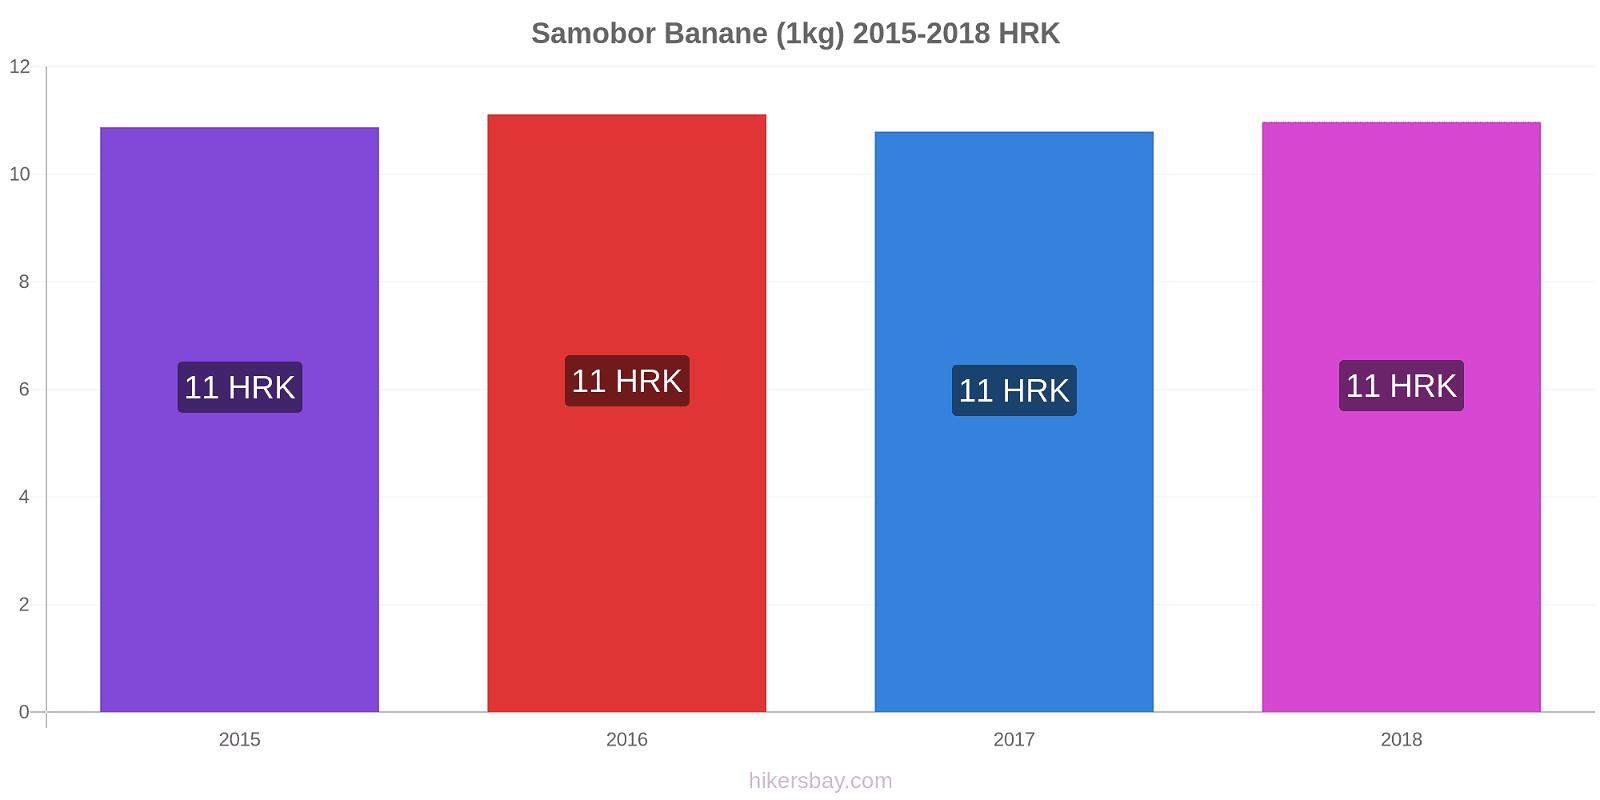 Samobor Preisänderungen Banane (1kg) hikersbay.com